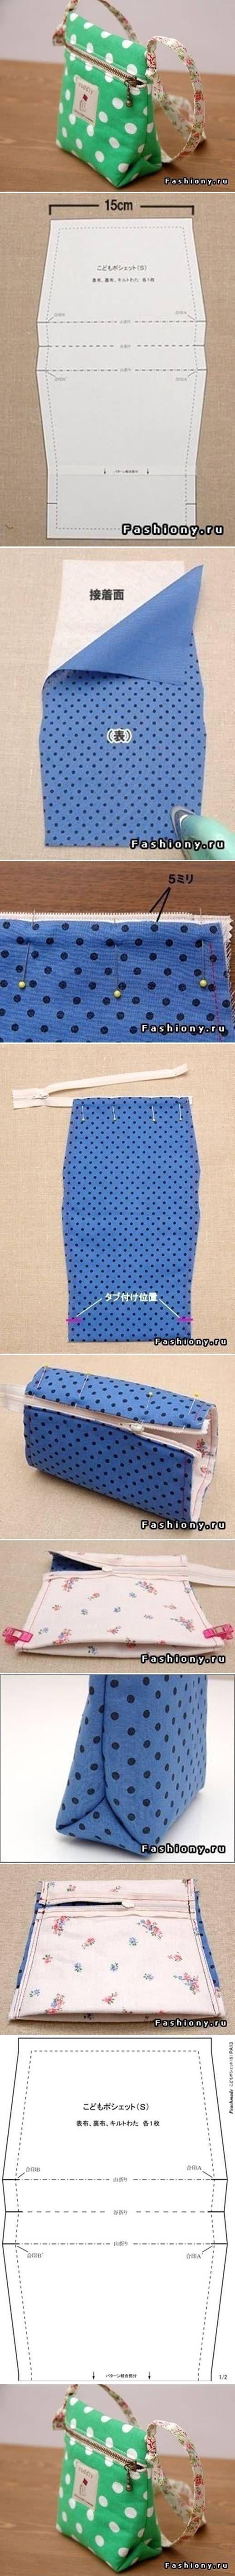 DIY Small Sew Handbag